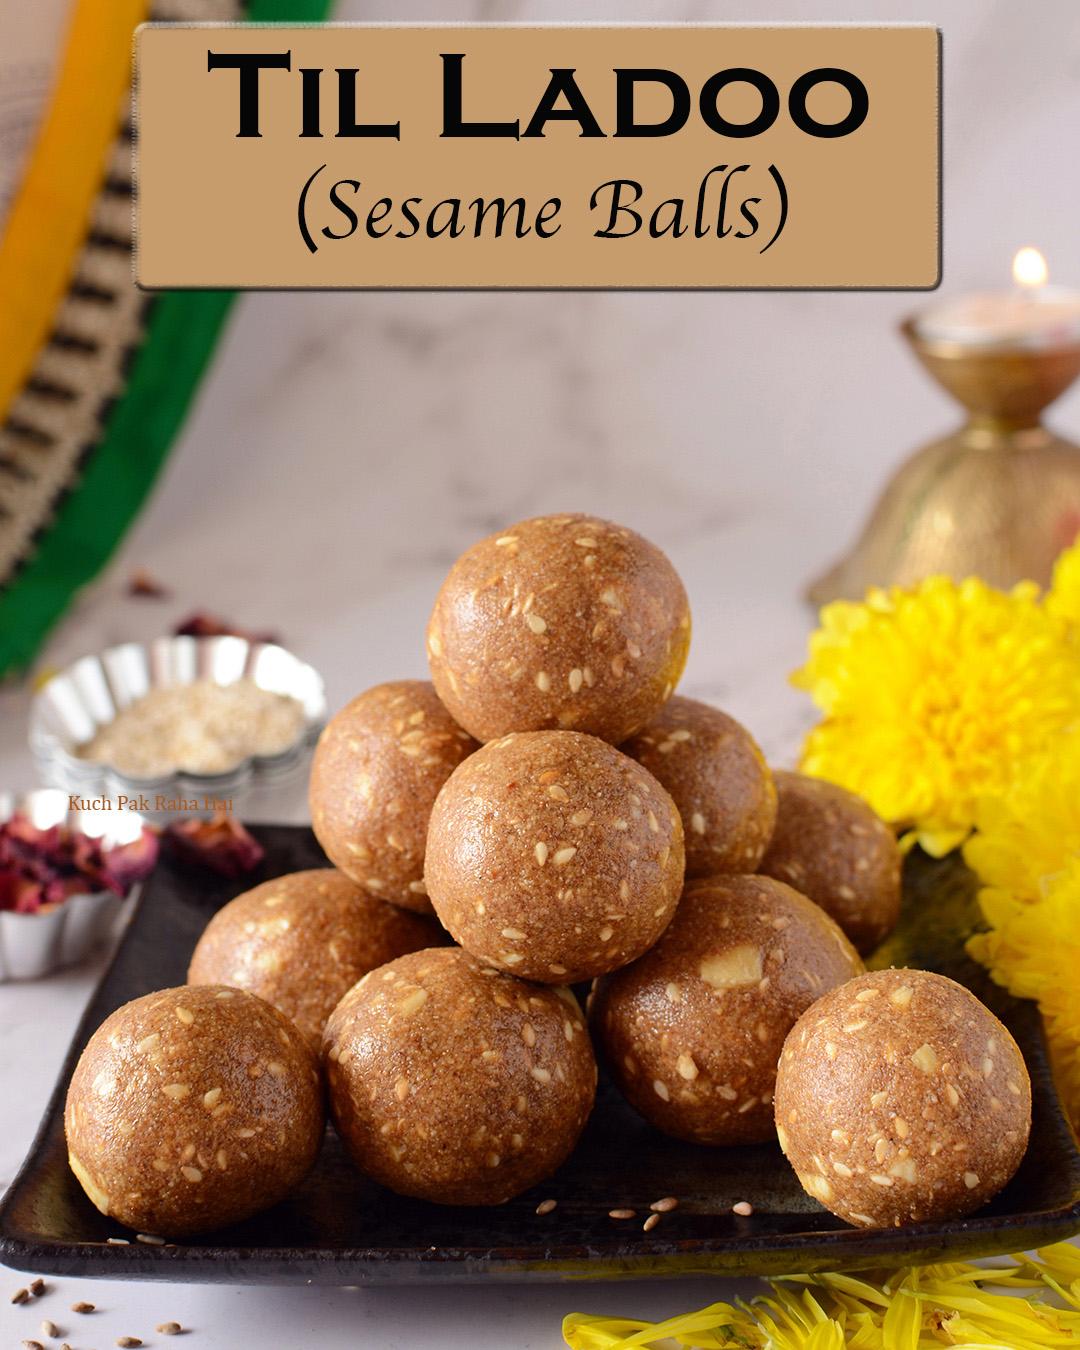 Til Ladoo Sesame Balls Recipe Gluten Free Vegan